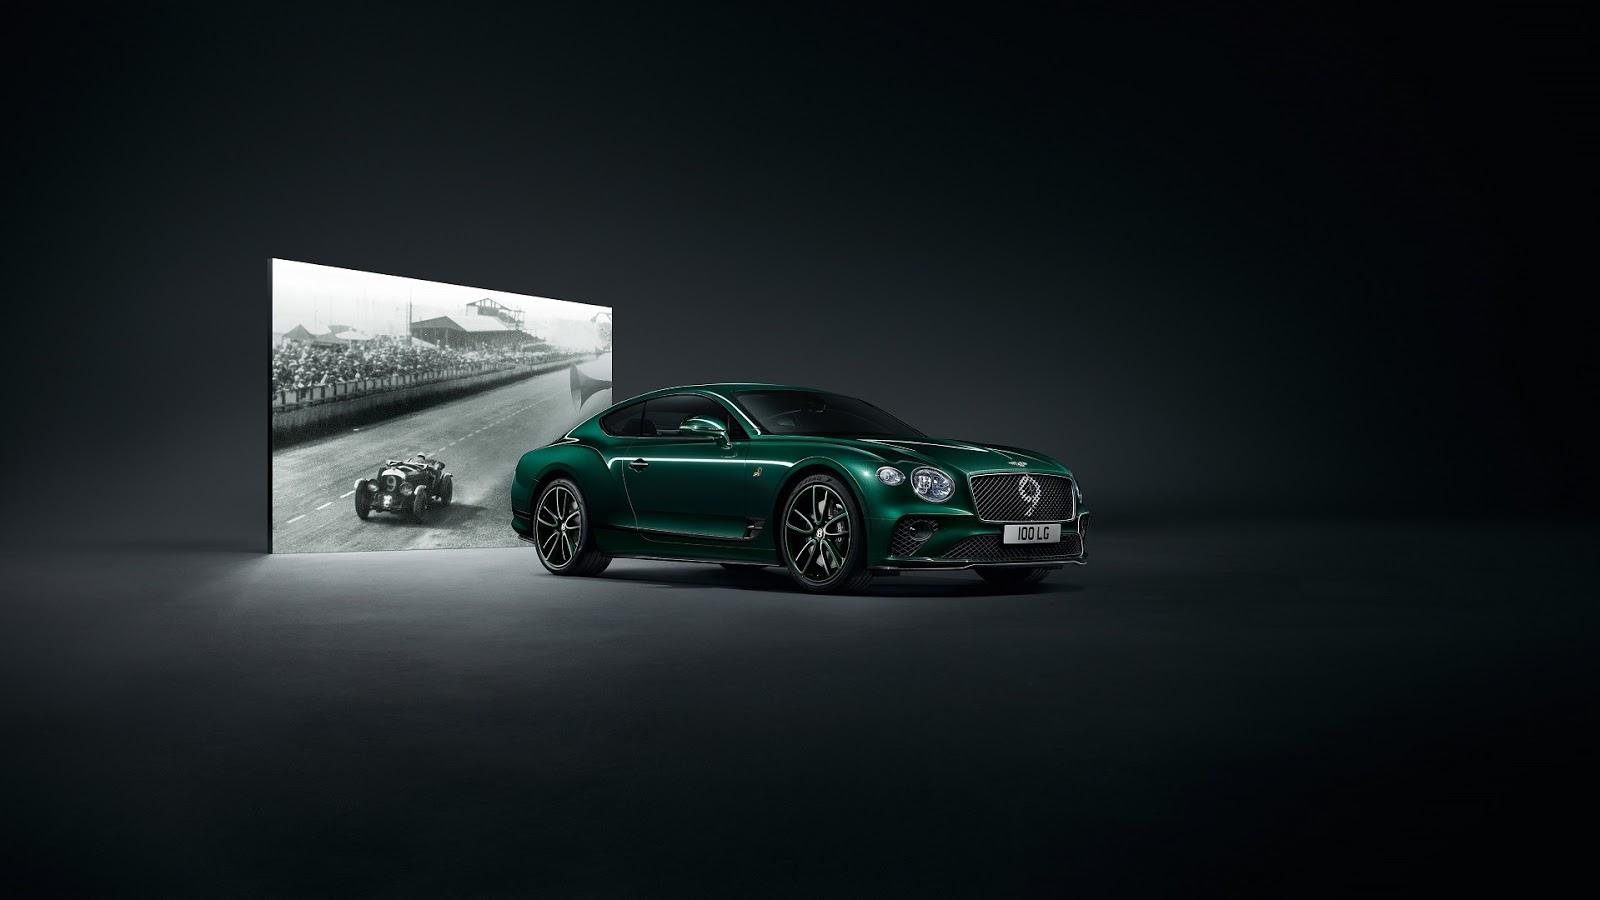 Bentley2BContinental2BGT2BNo2B92Bby2BMulliner2B 2B3